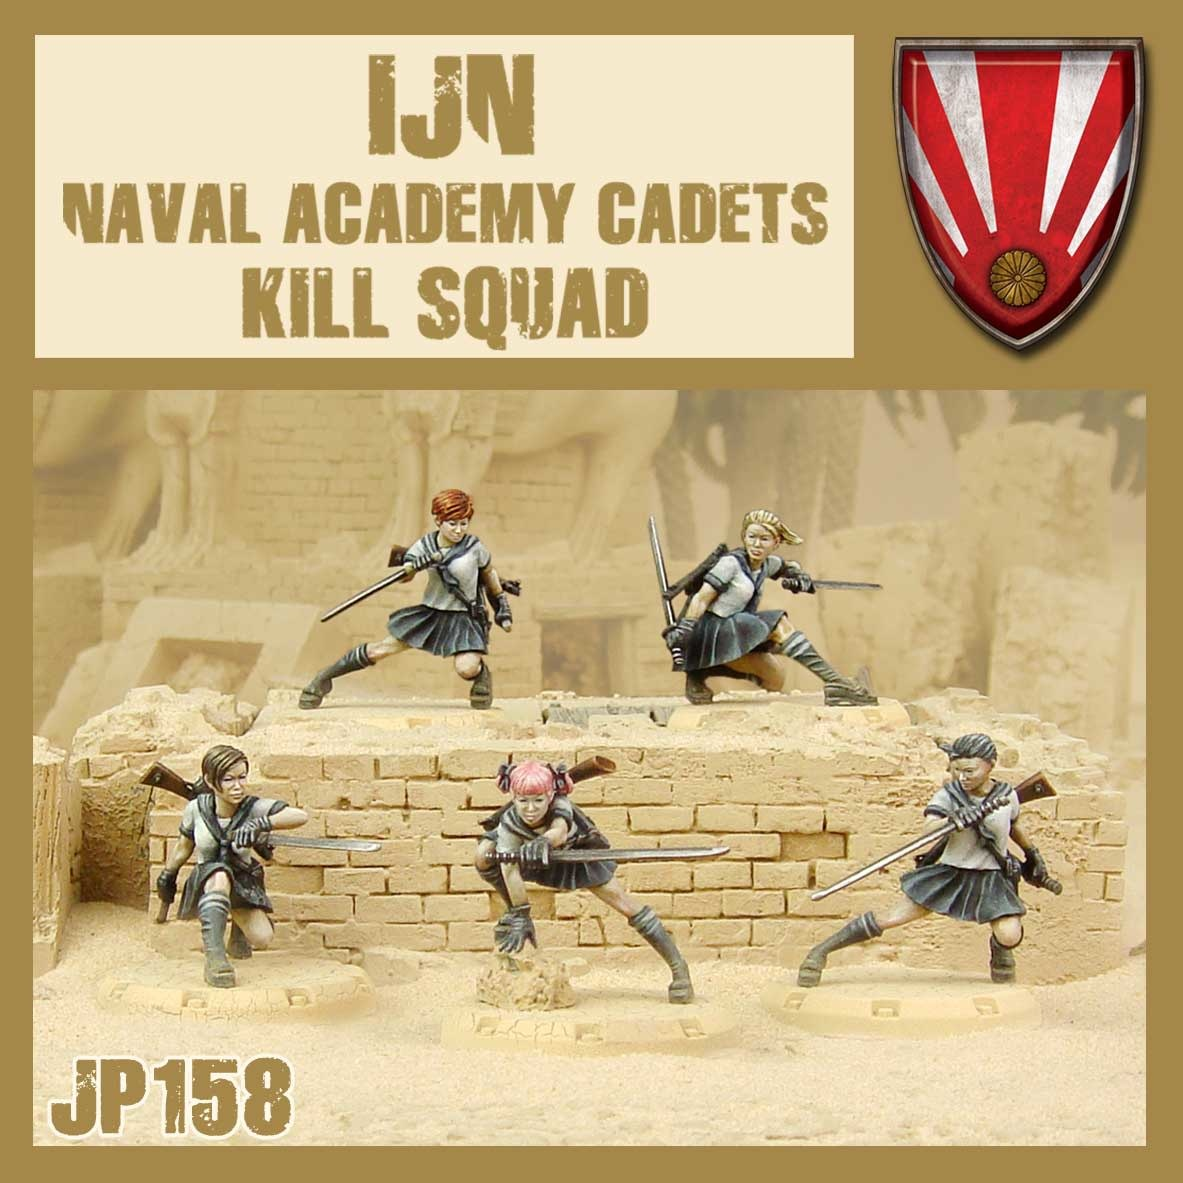 DUST USA DUST DROP-SHIP: IJN Naval Academy Cadet Kill Squad